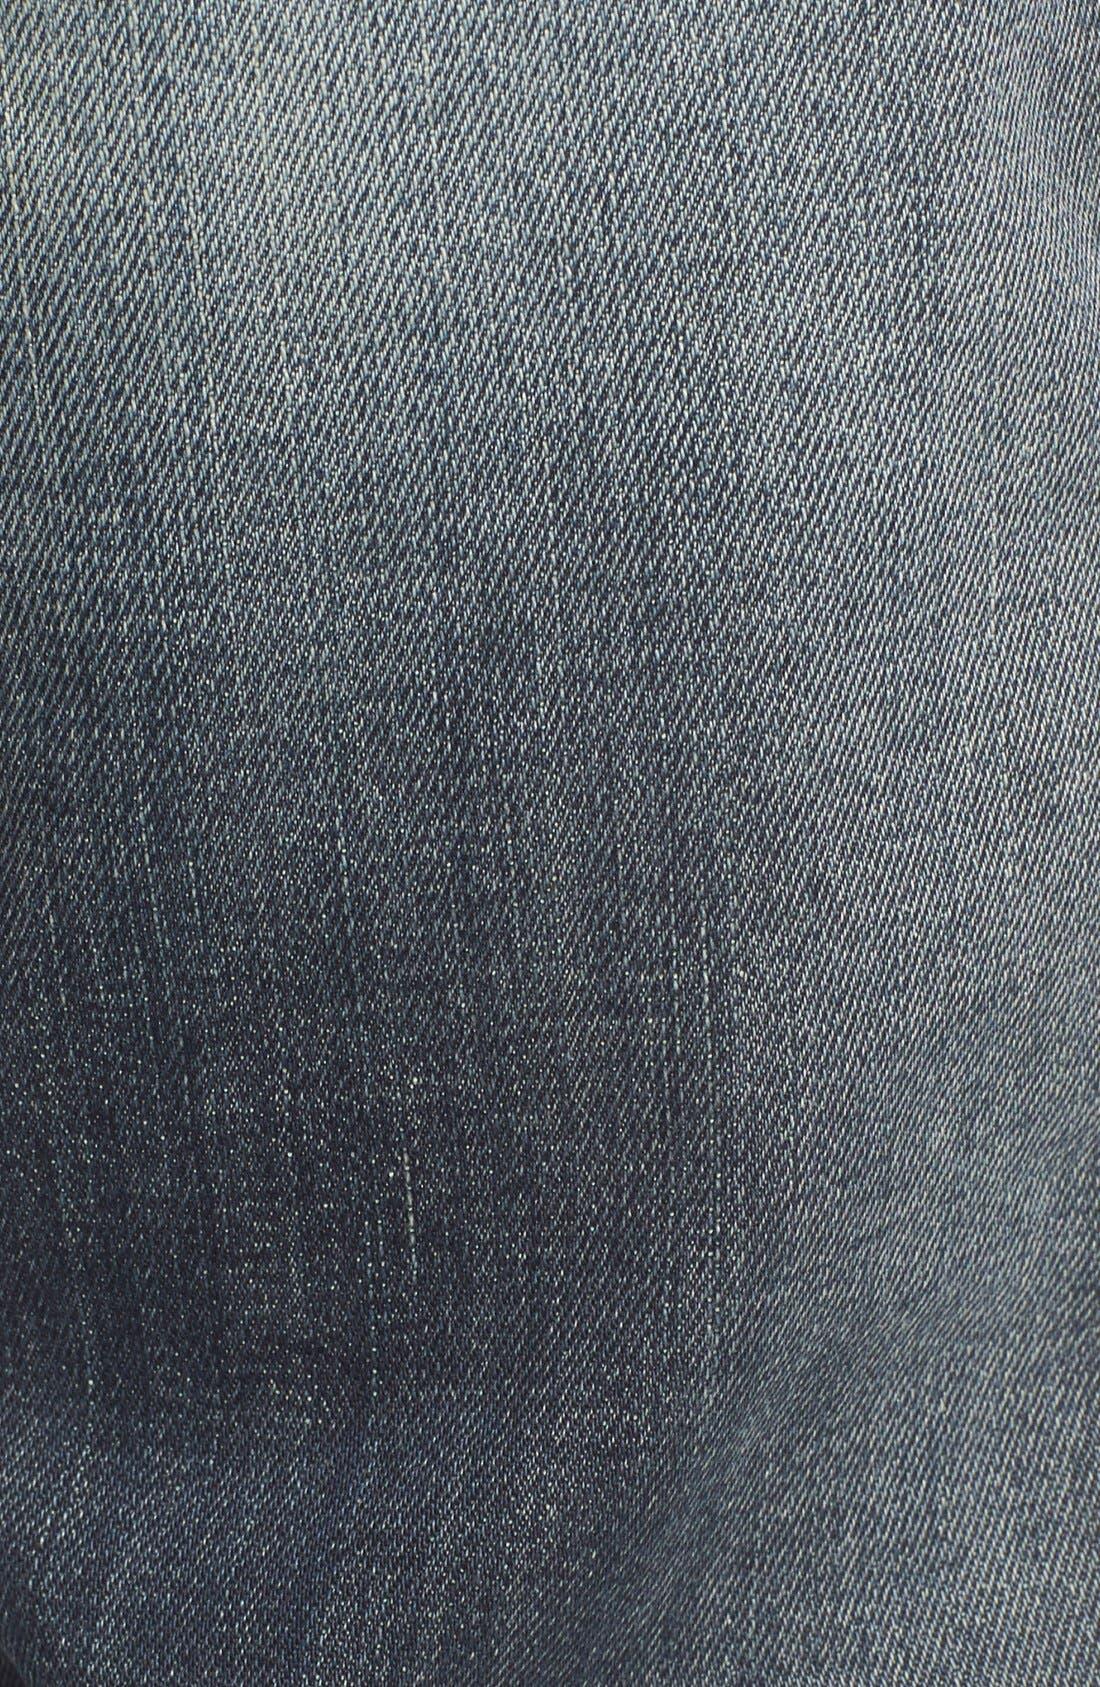 'Zathan' Bootcut Jeans,                             Alternate thumbnail 5, color,                             885K